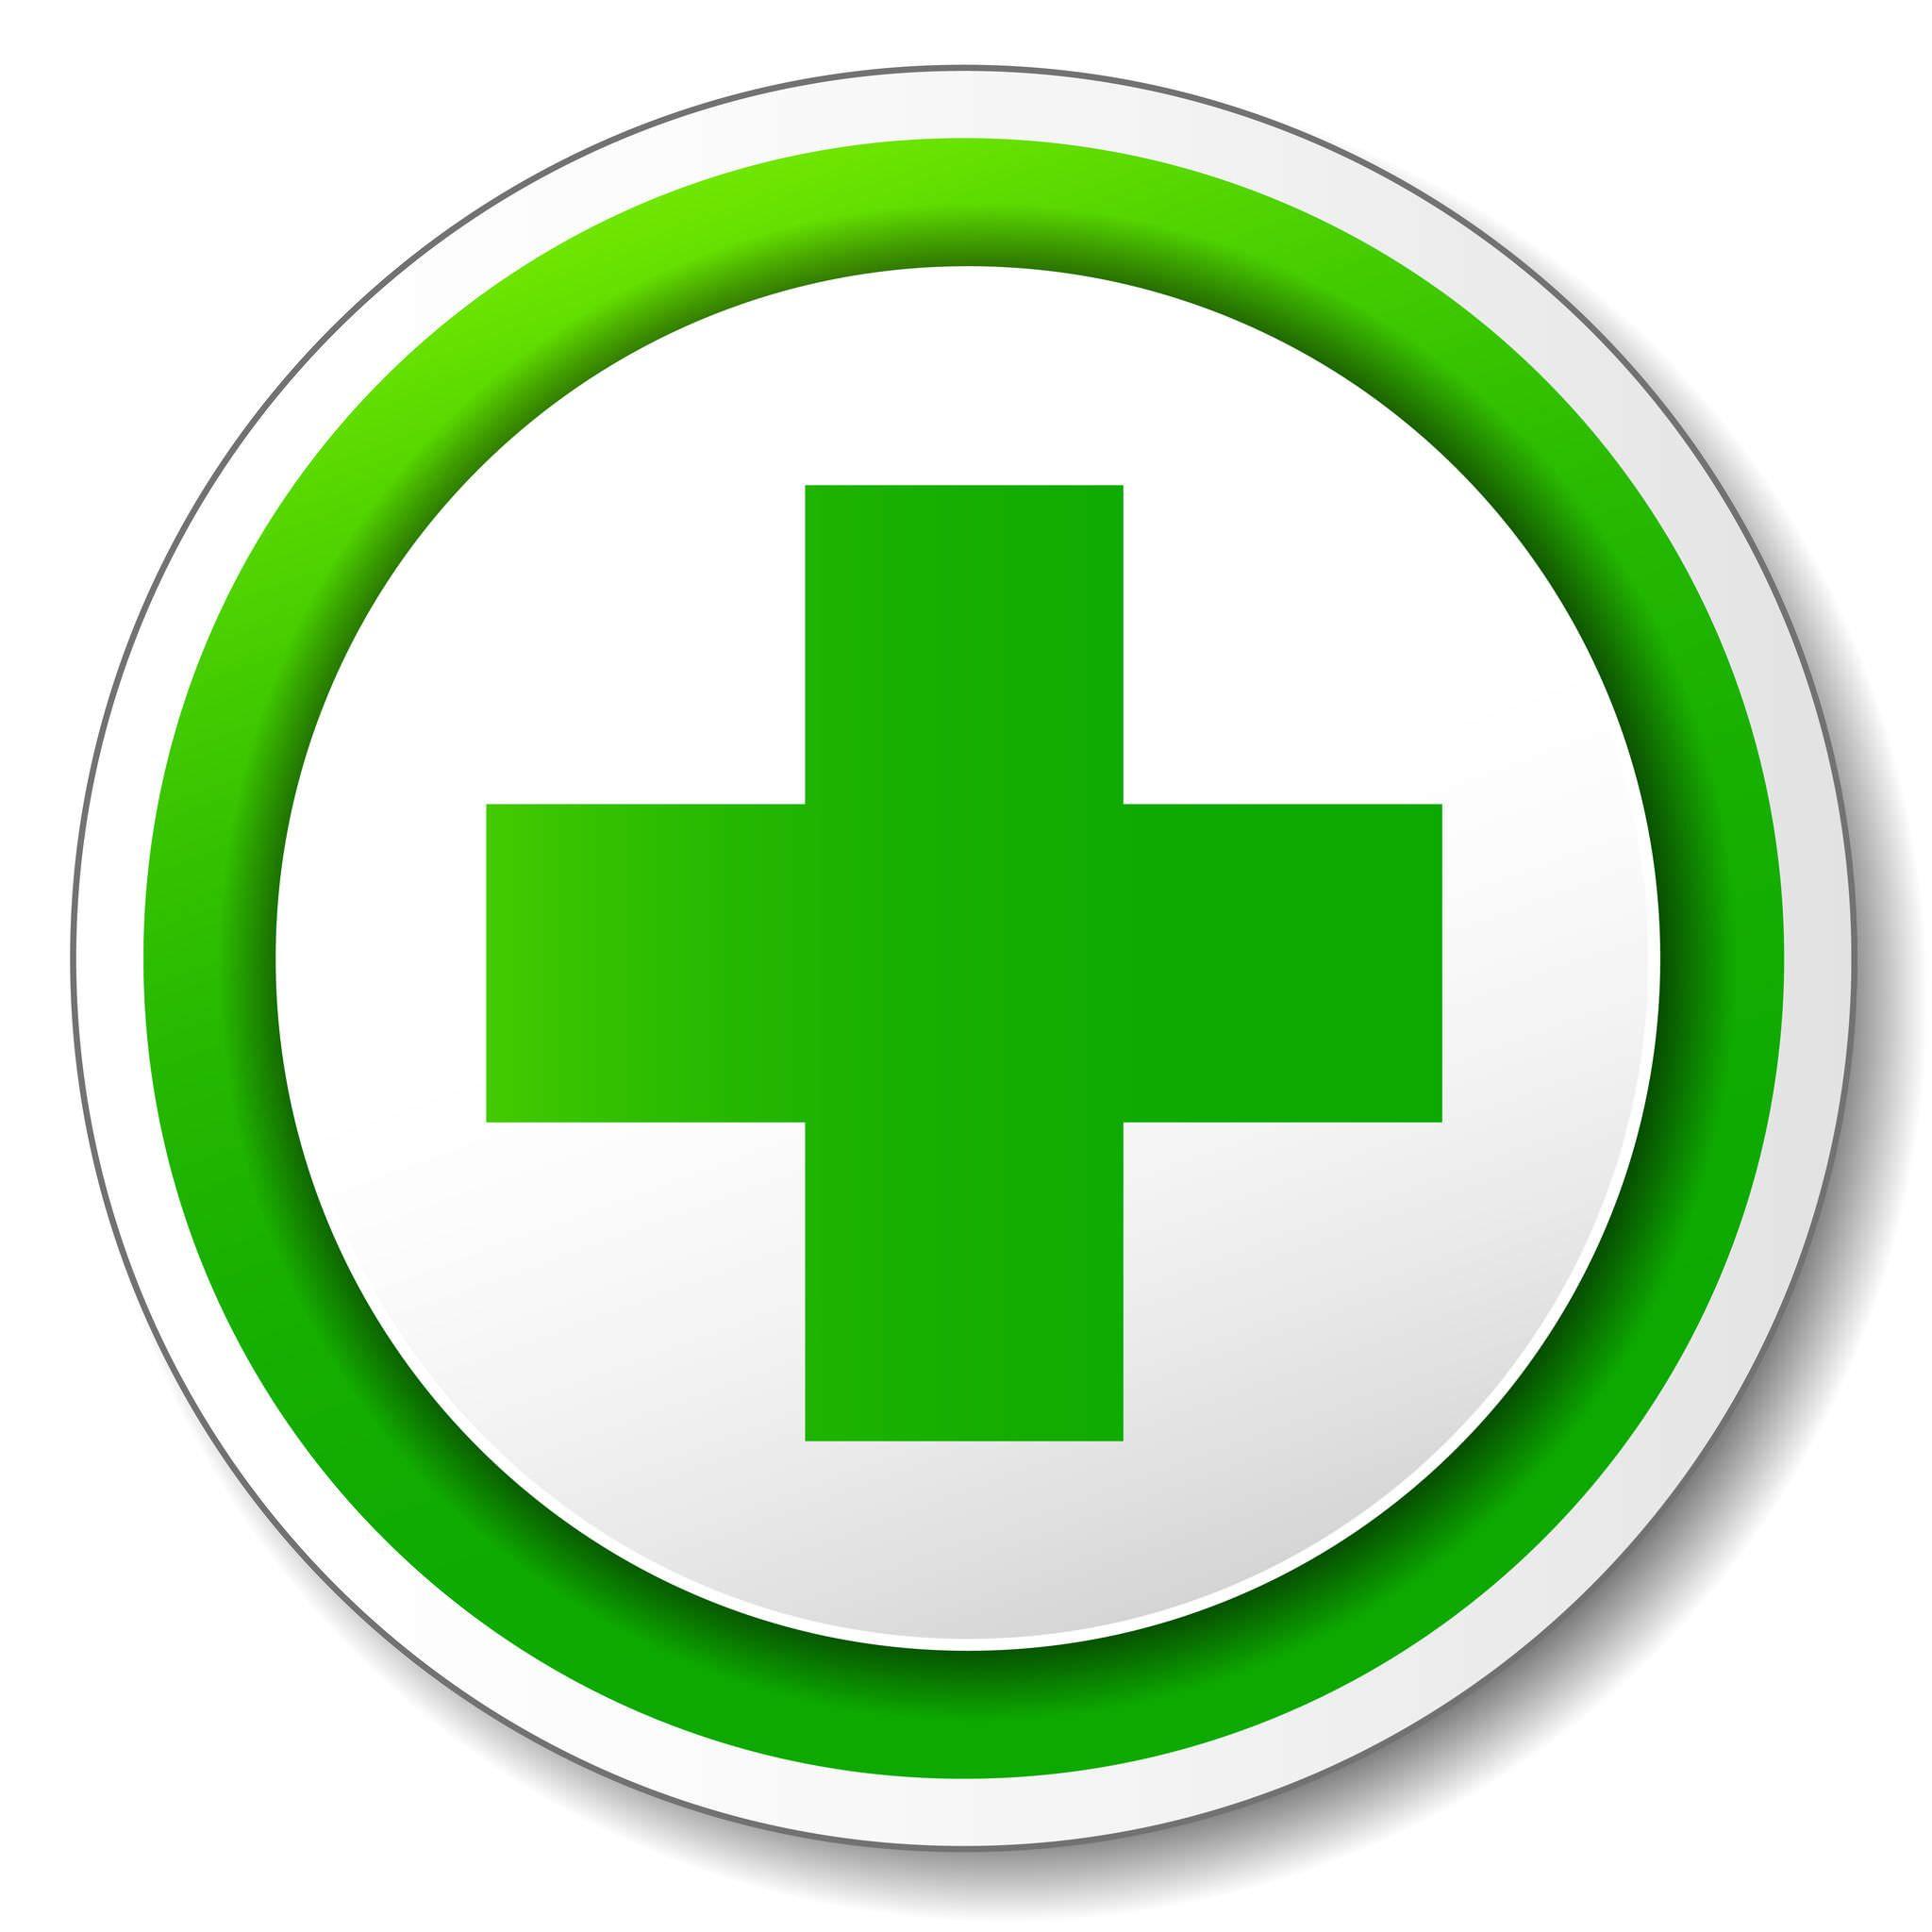 , Fourth Canadian pharmacy chain plans medical marijuana sales